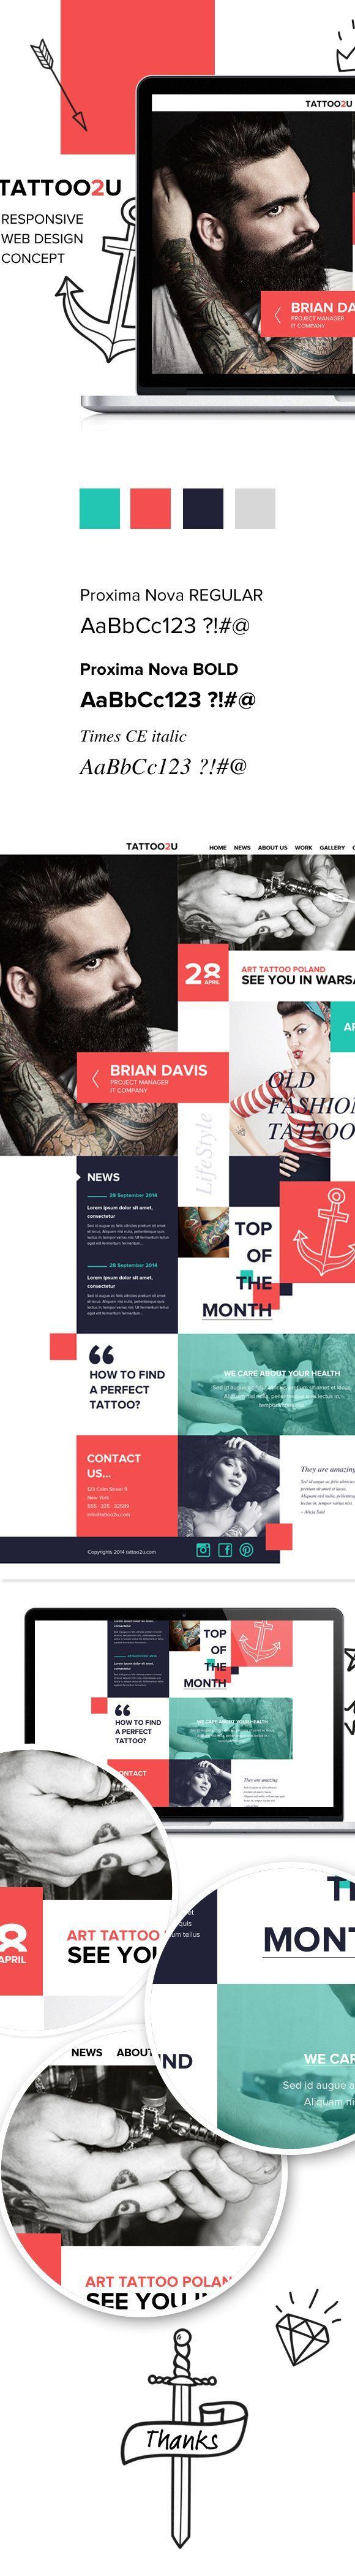 Tattoo2U.  #webdesign #it #web #design #layout #userinterface #website #webdesign